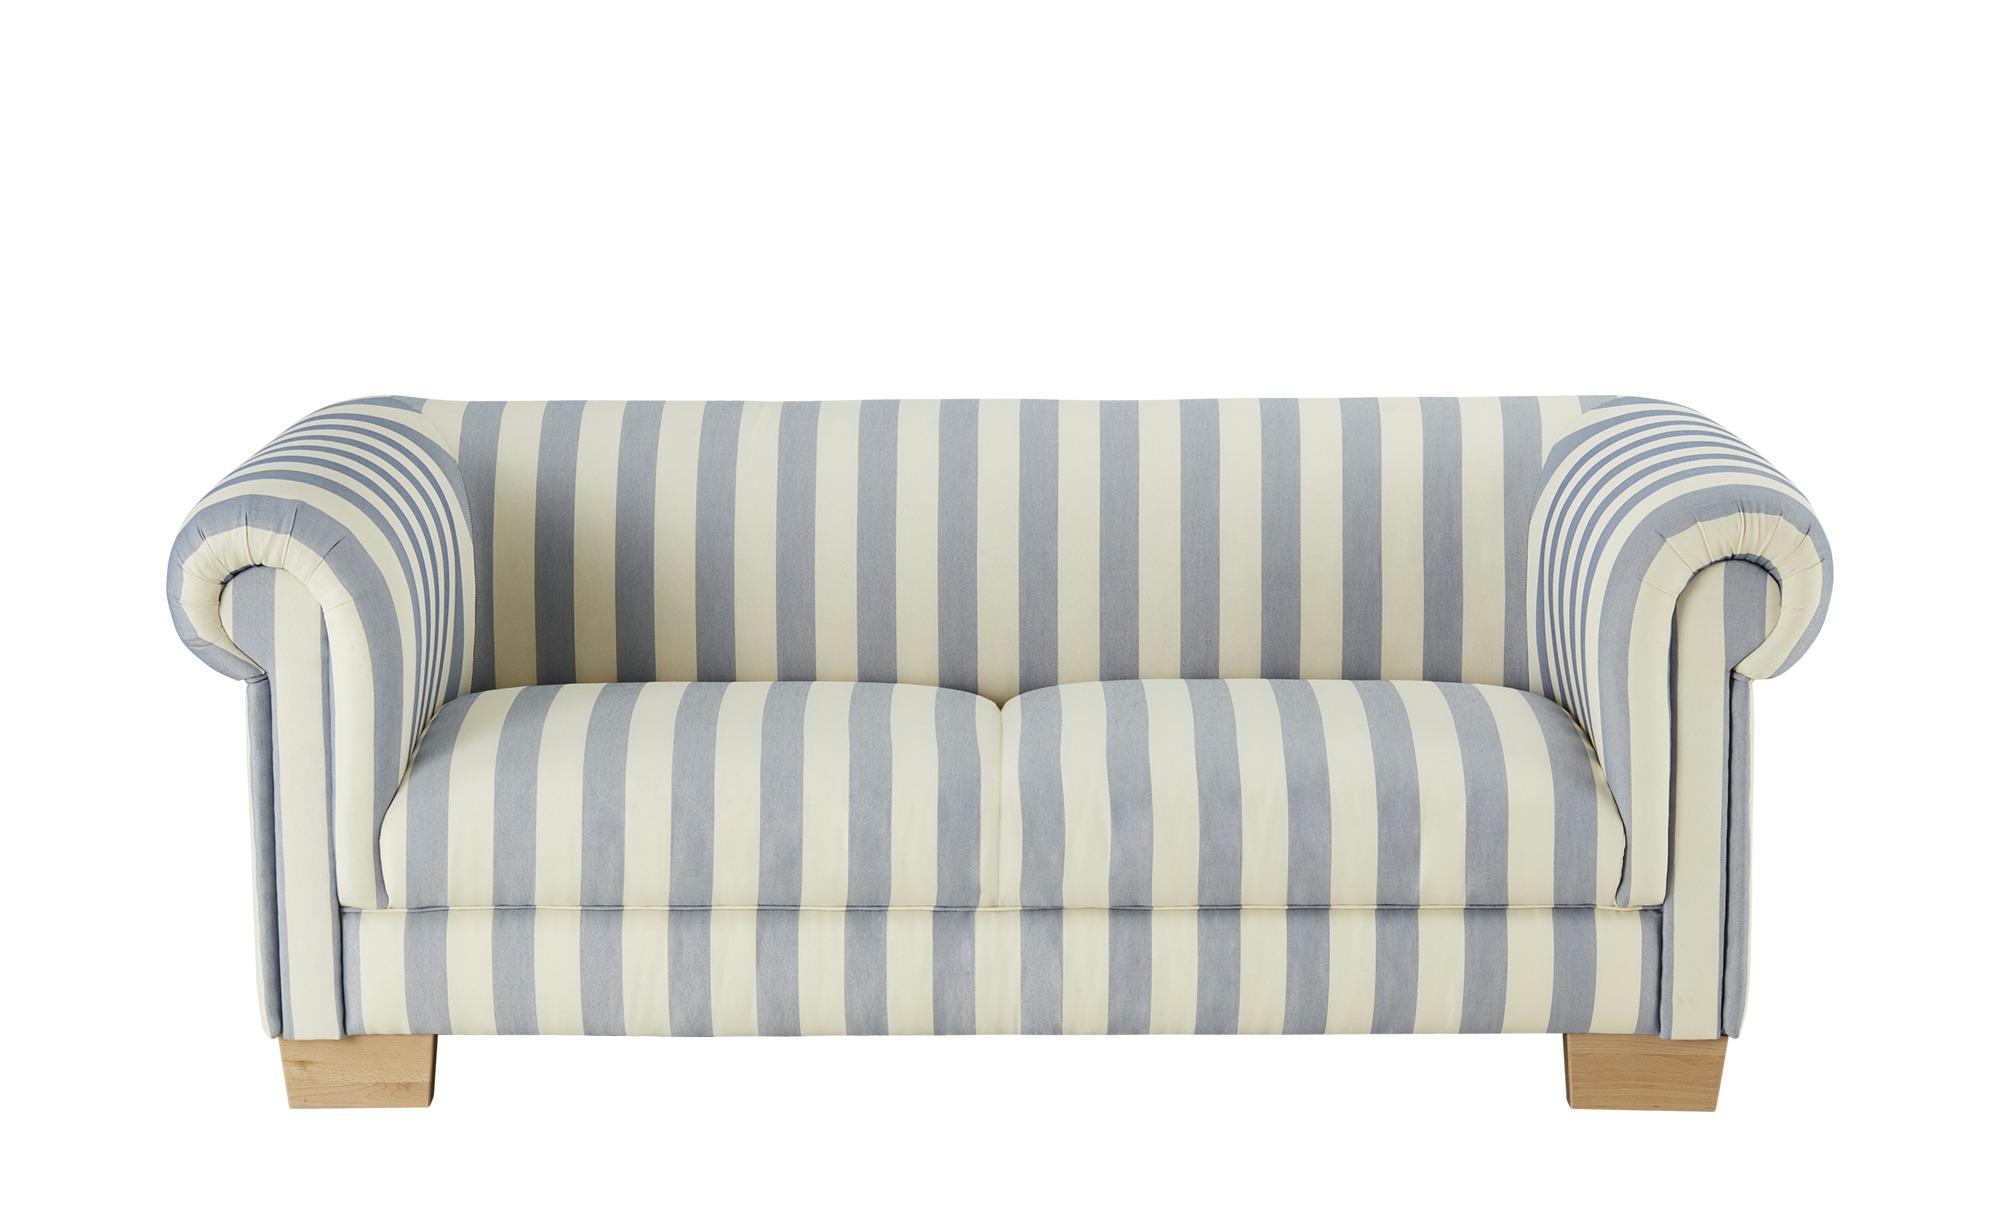 smart Sofa 3-sitzig blau/weiß - Flachgewebe Maria ¦ mehrfarbig ¦ Maße (cm): B: 202 H: 78 T: 94 Polstermöbel > Sofas > 3-Sitzer - Höffner